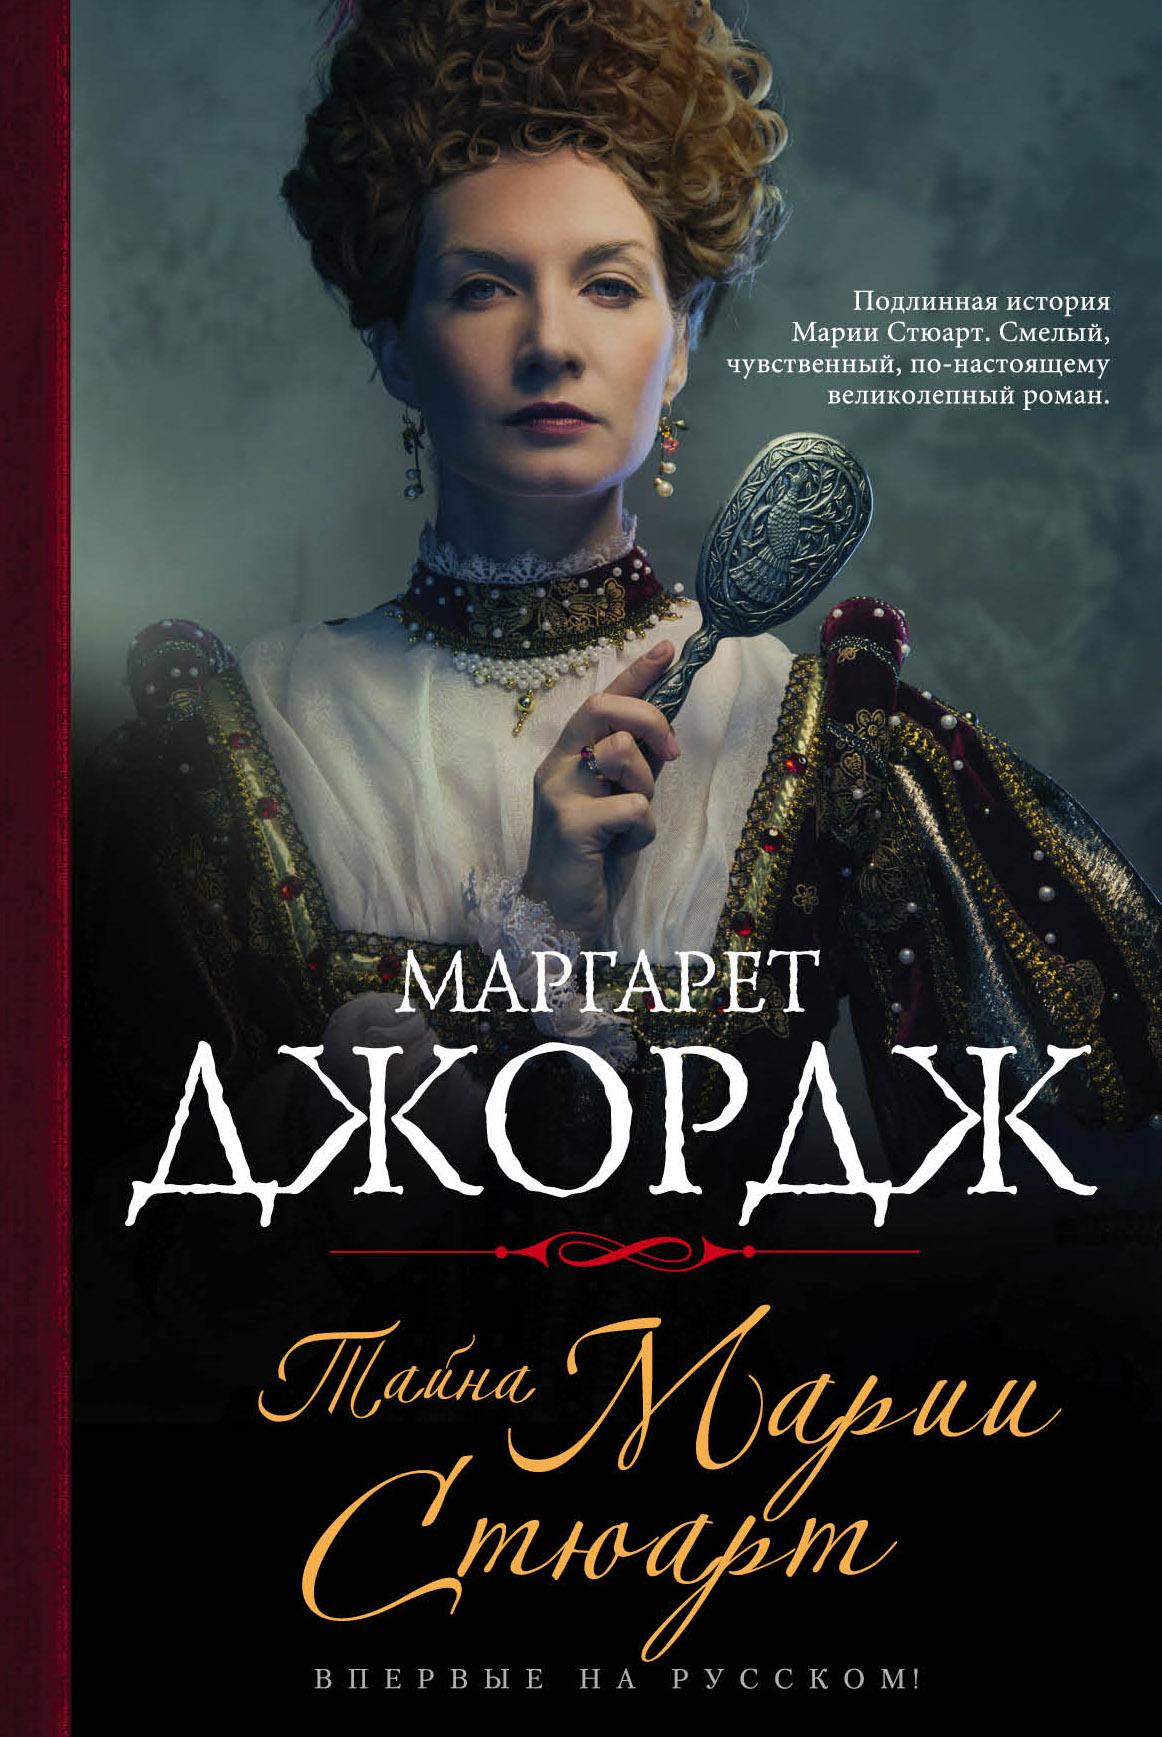 Джордж М. Тайна Марии Стюарт ольга дмитриева елизавета тюдор